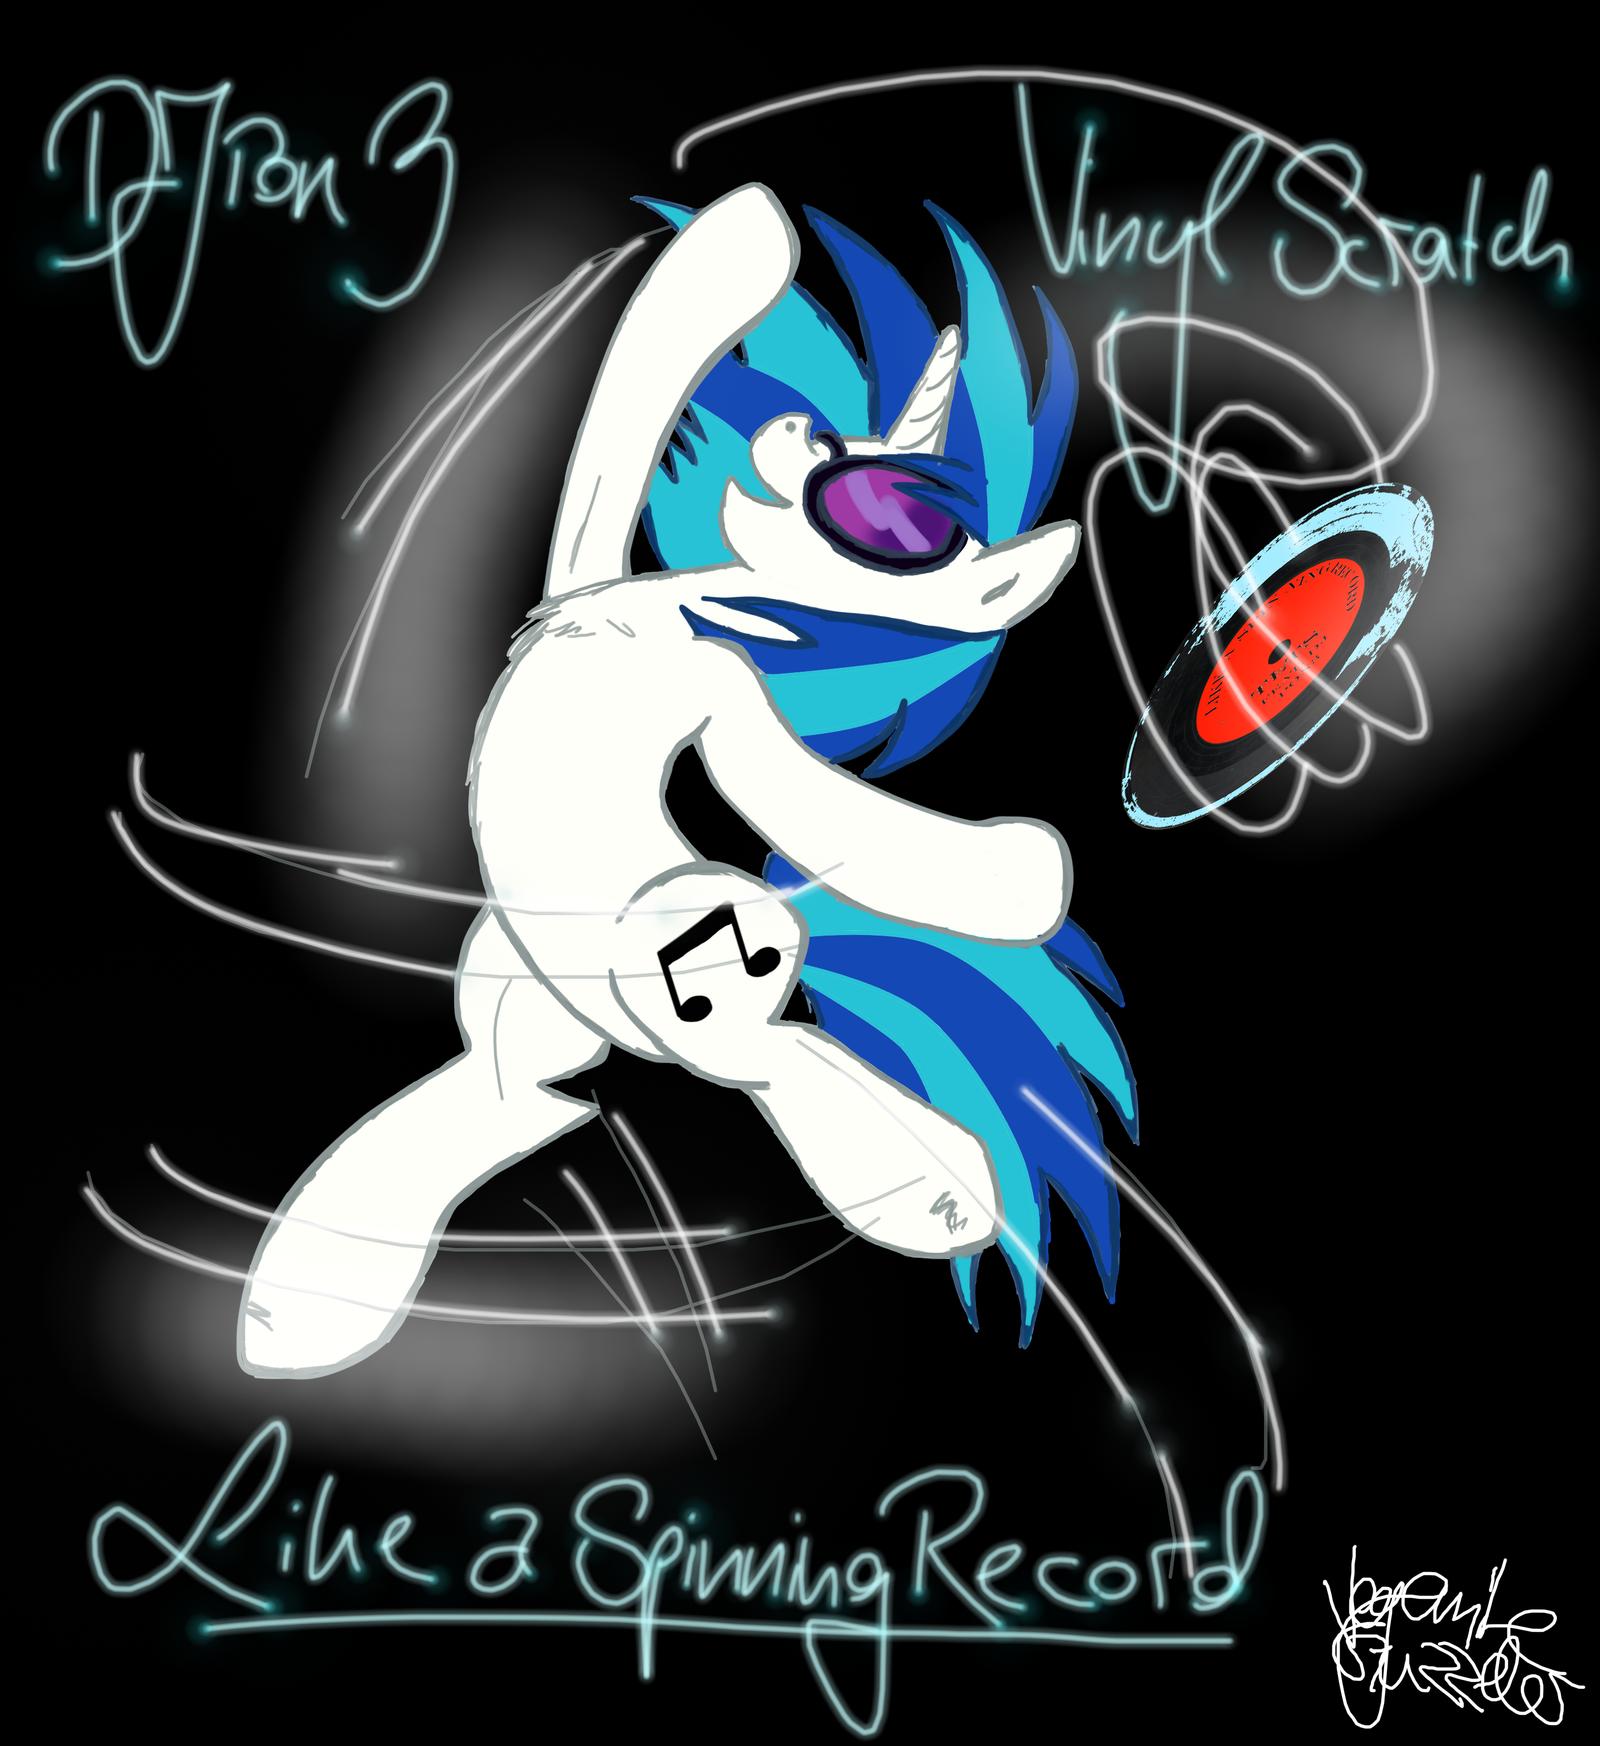 Like A Spinning Record by VegemiteGuzzler